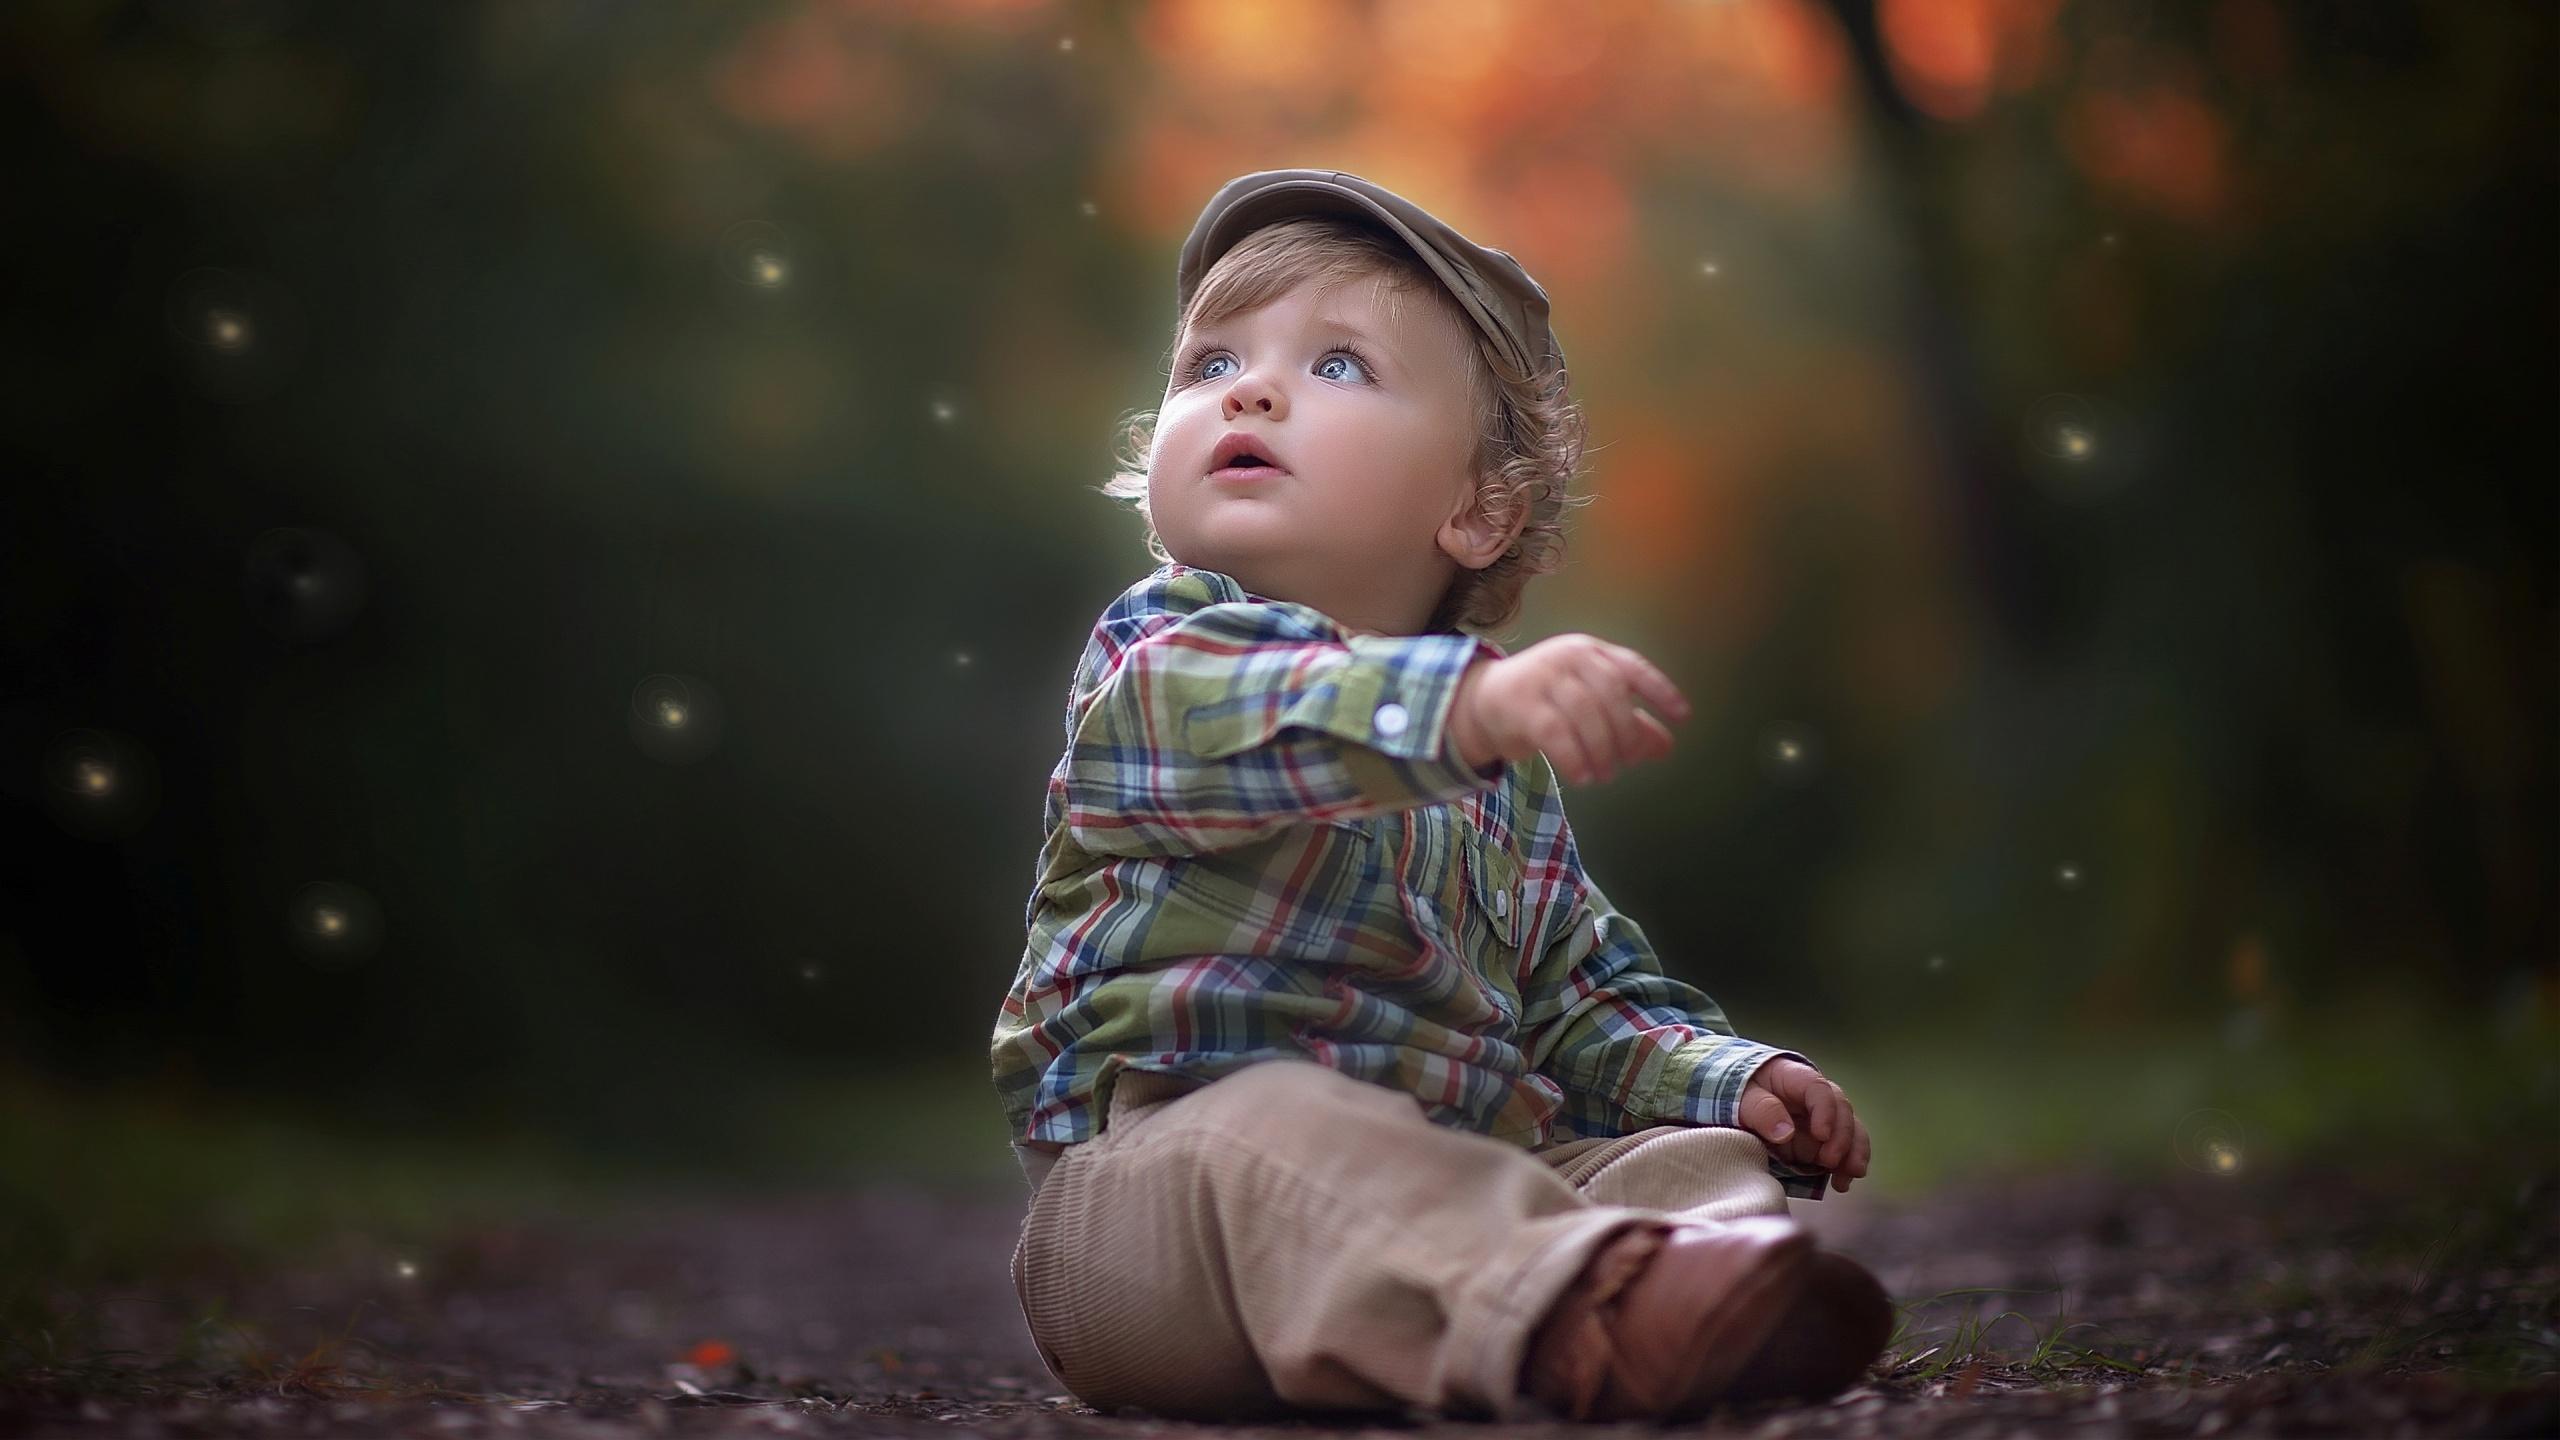 Baby Kids Wallpaper Hd